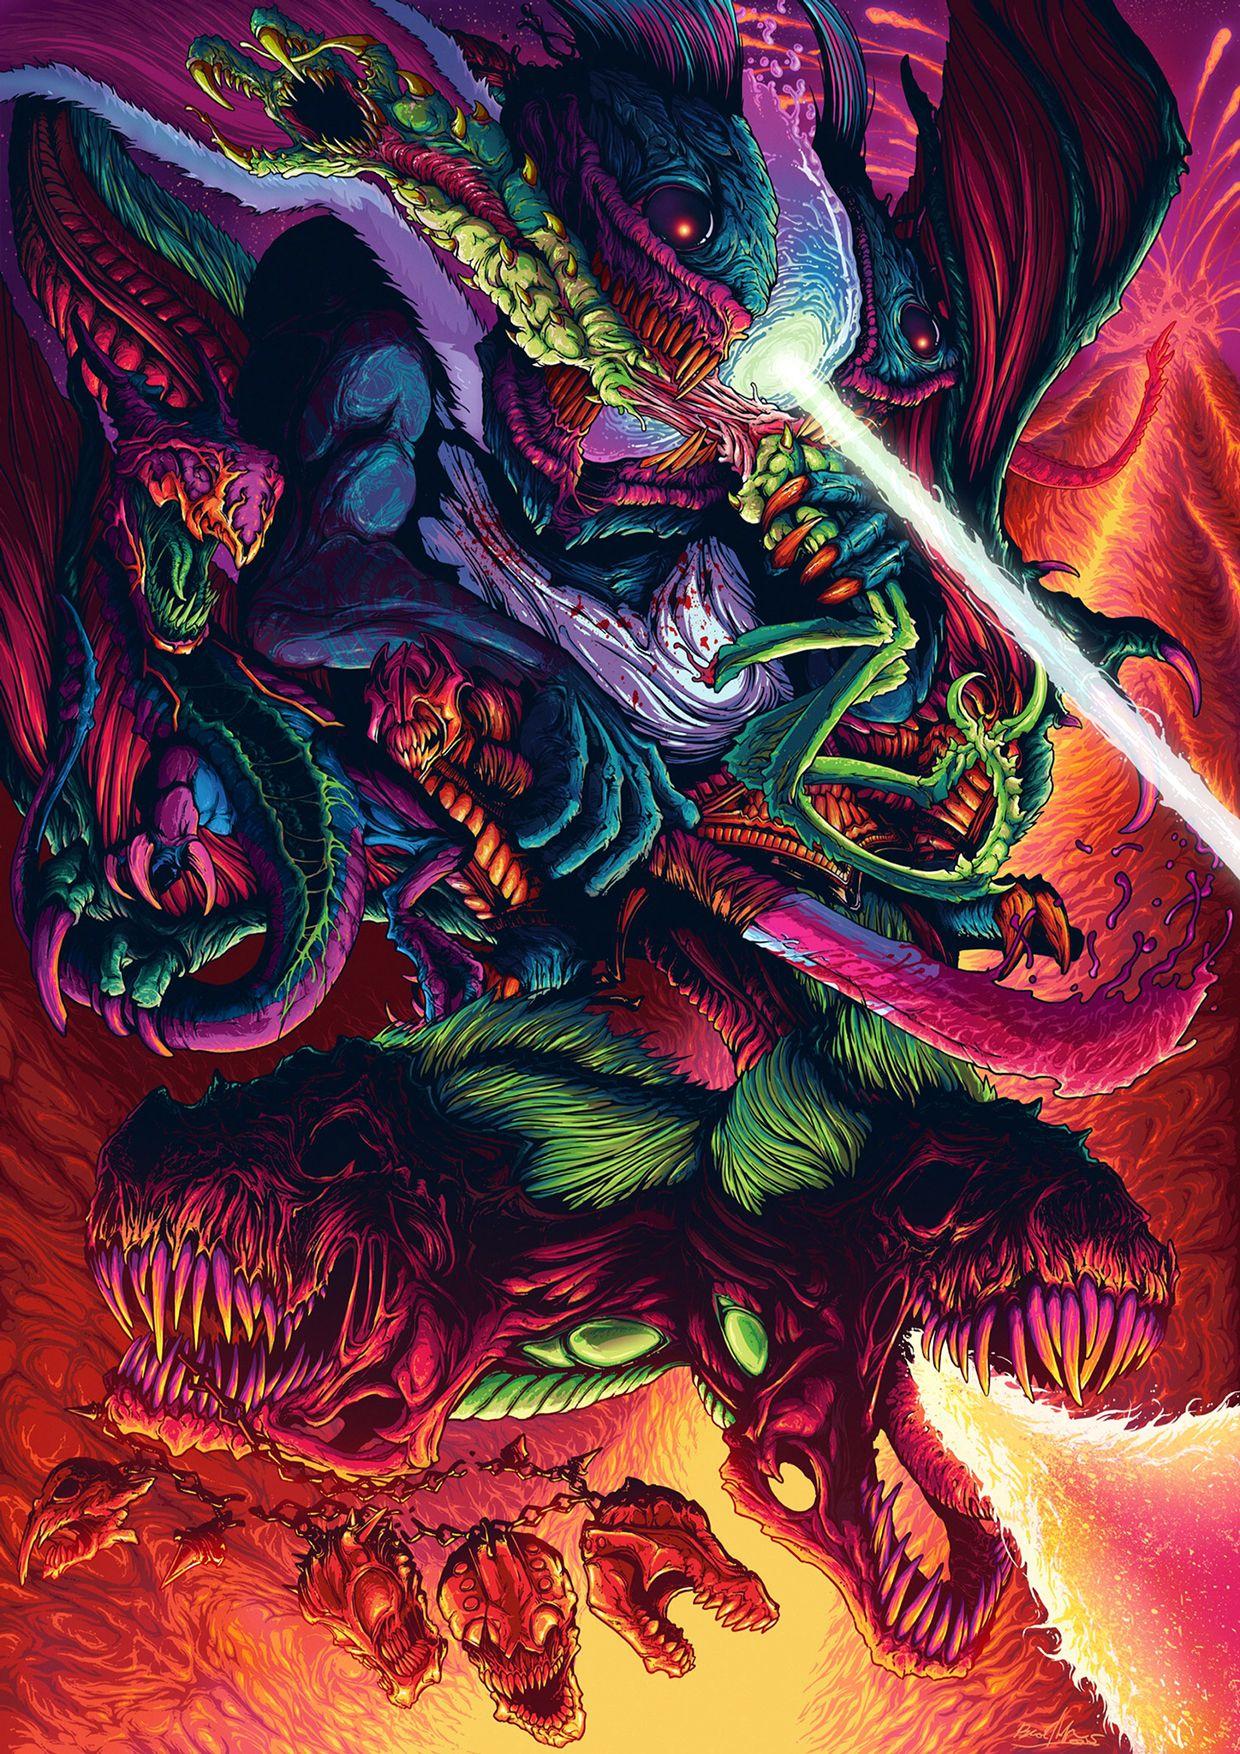 By Brock Hofer Rebel6 Hyper Beast Wallpaper Beast Wallpaper Hyper Beast